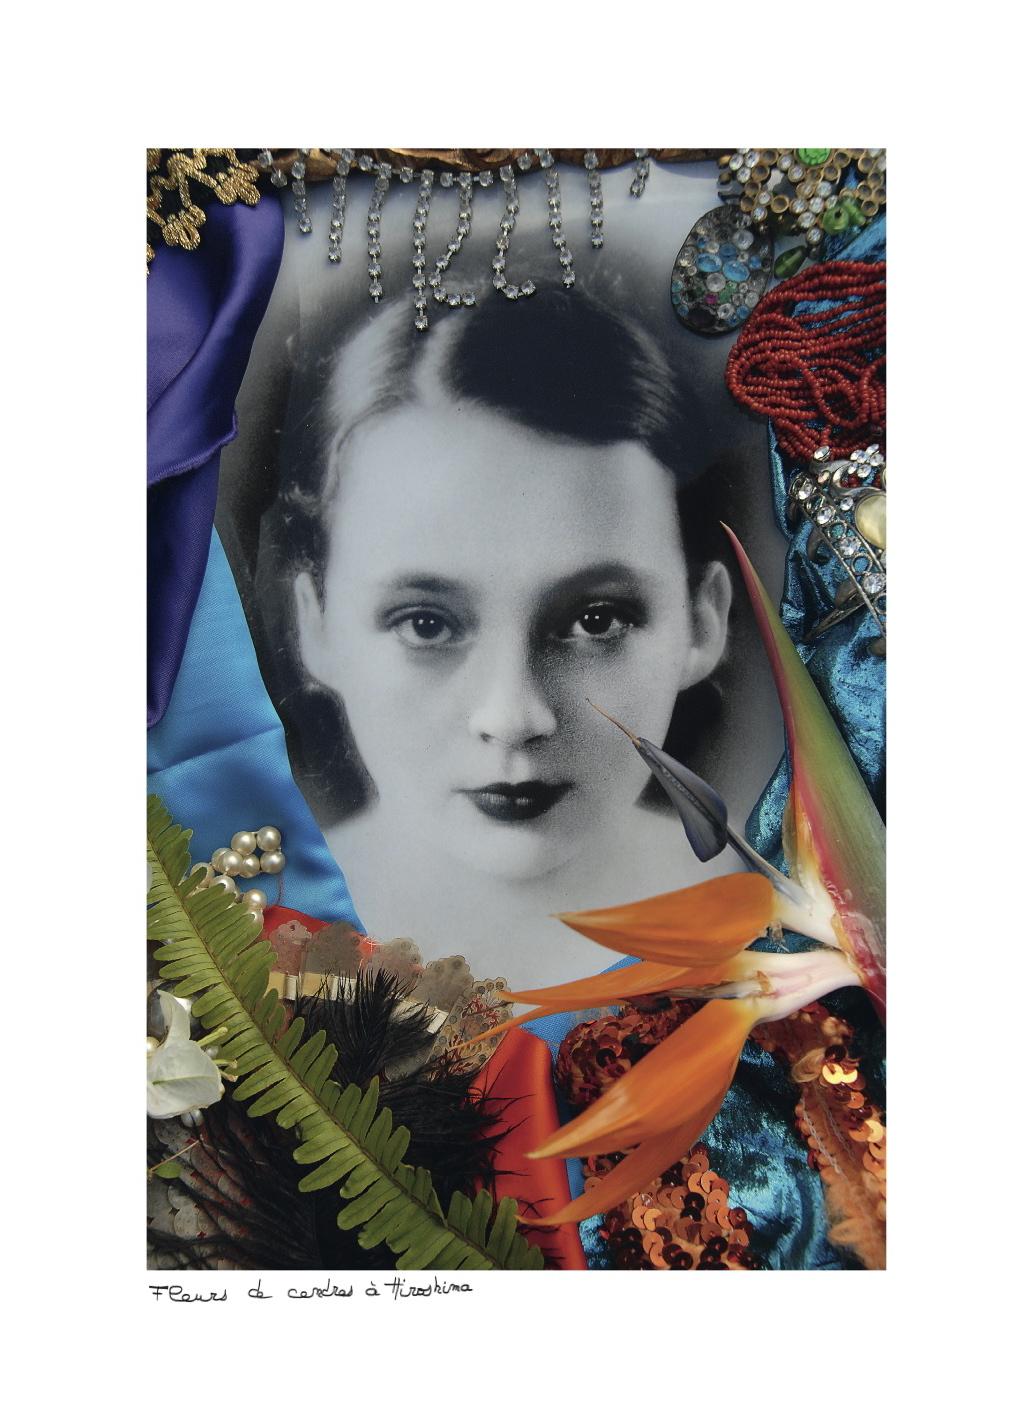 Christine Spengler - Hommage à Marguerite Duras - Fleurs de cendres à Hiroshima